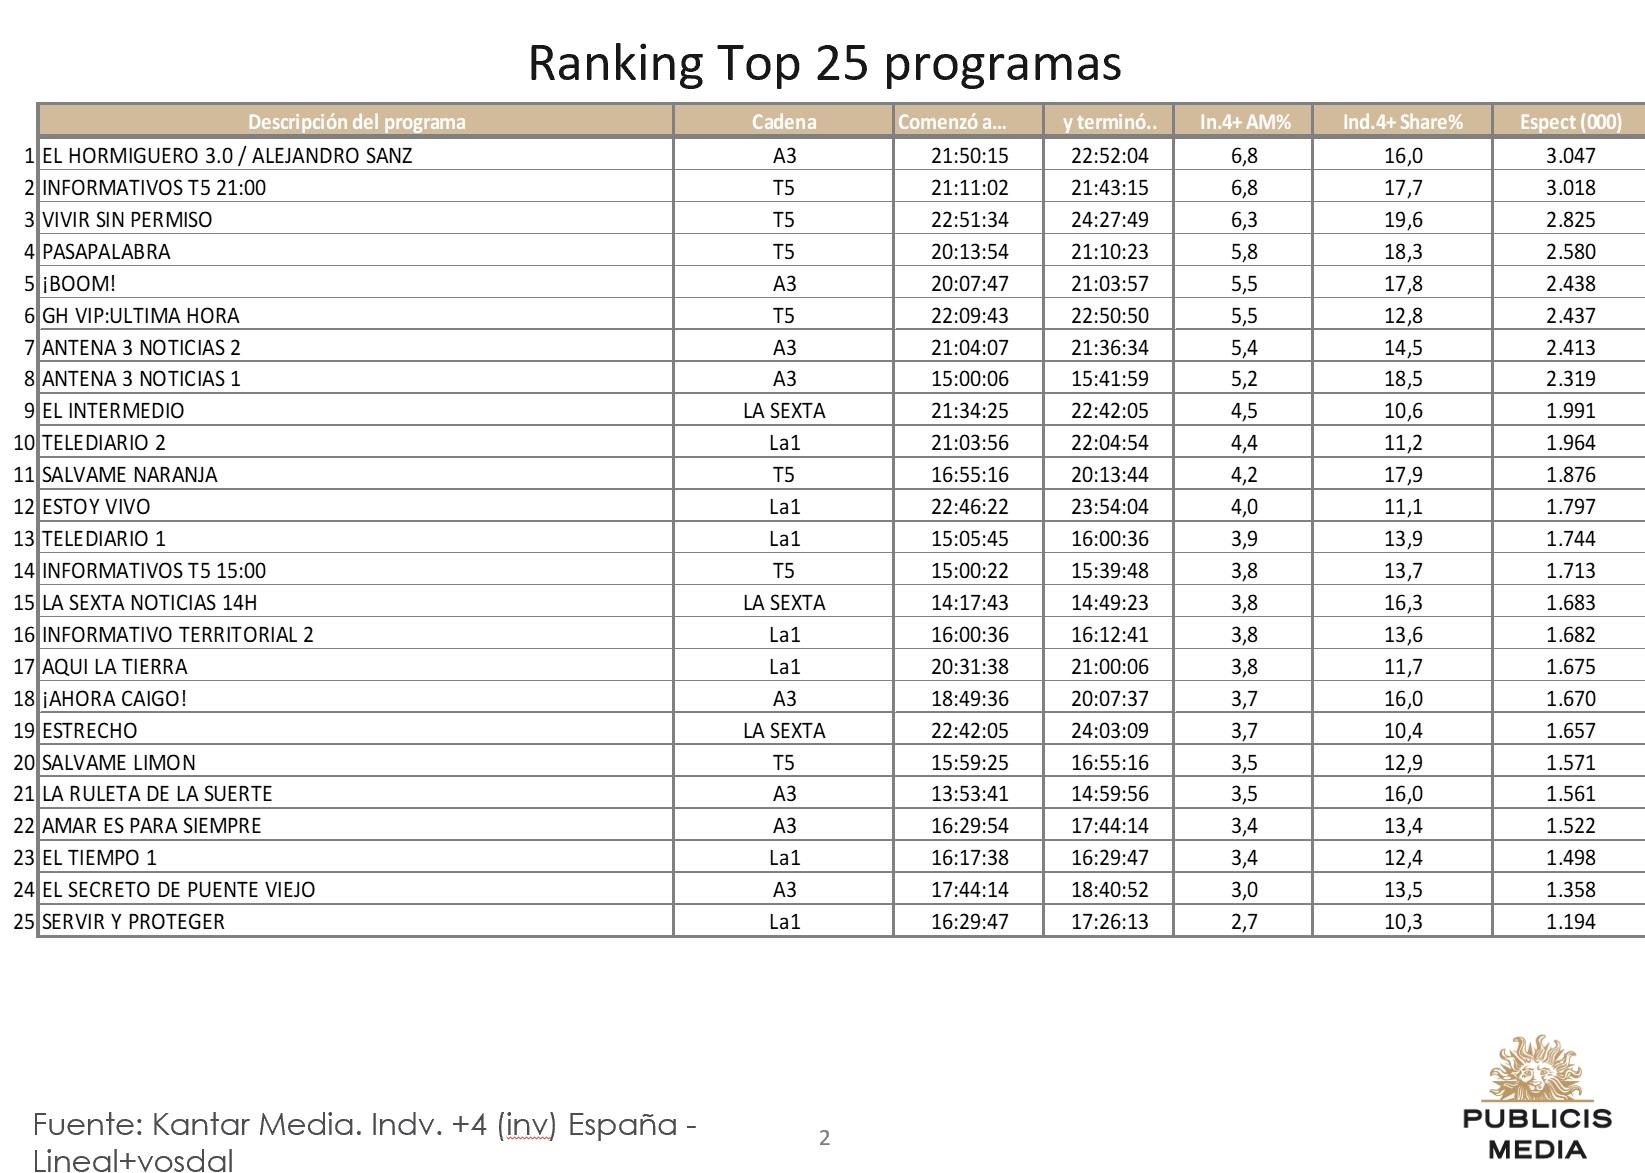 https://www.programapublicidad.com/wp-content/uploads/2018/12/Top-25-Publicis-media-3-dic-2018-programapublicidad-muy-grande.jpg